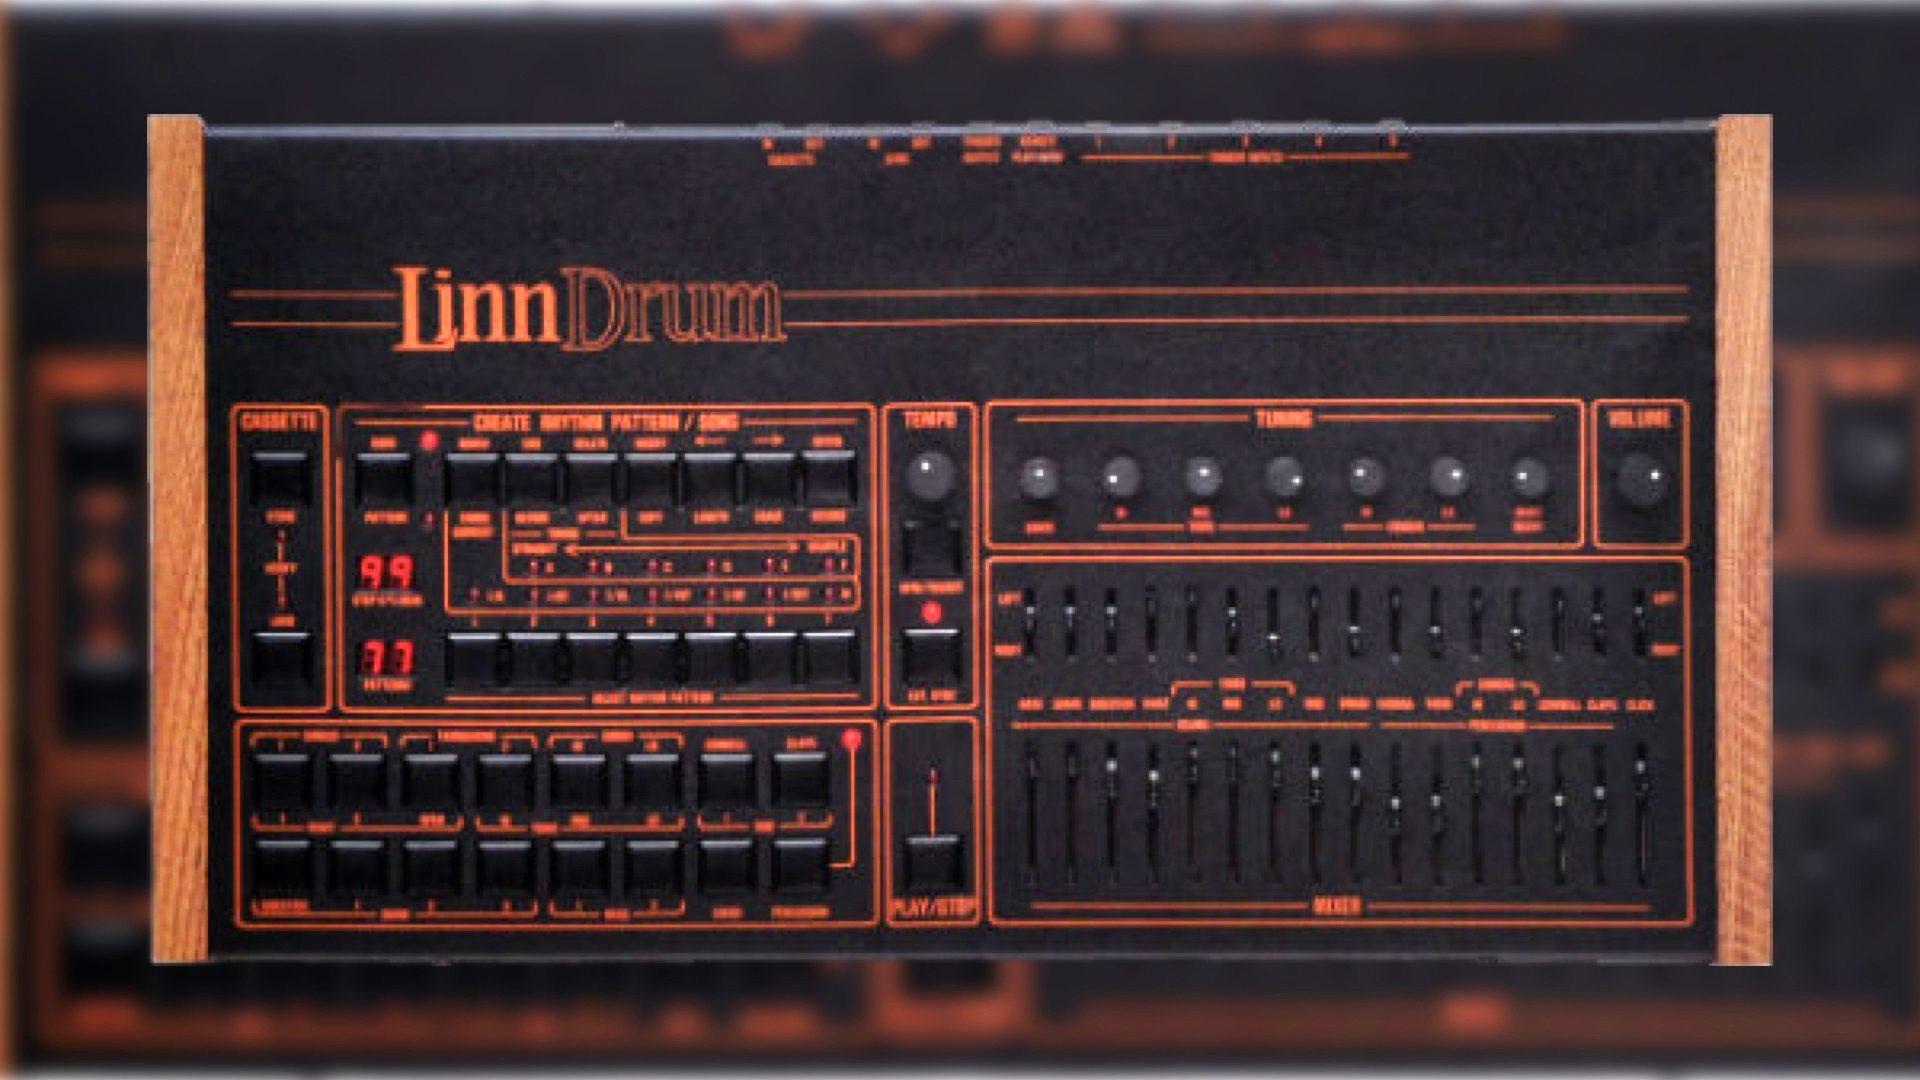 Behringer LMX, LinnDrum Drum Machine Klon - AMAZONA de